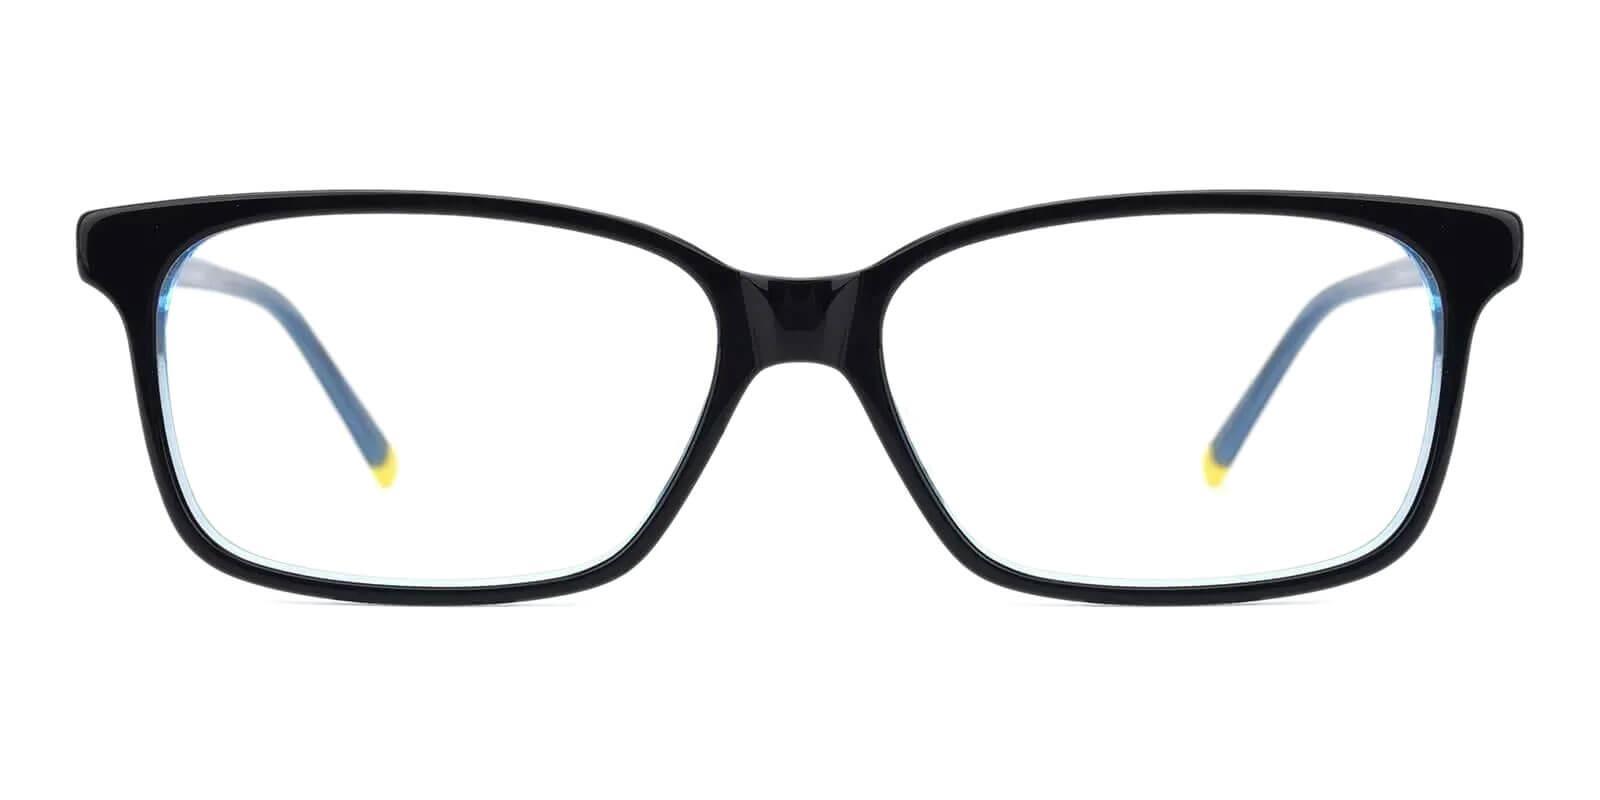 Lochloosa Blue Acetate Eyeglasses , SpringHinges , UniversalBridgeFit Frames from ABBE Glasses